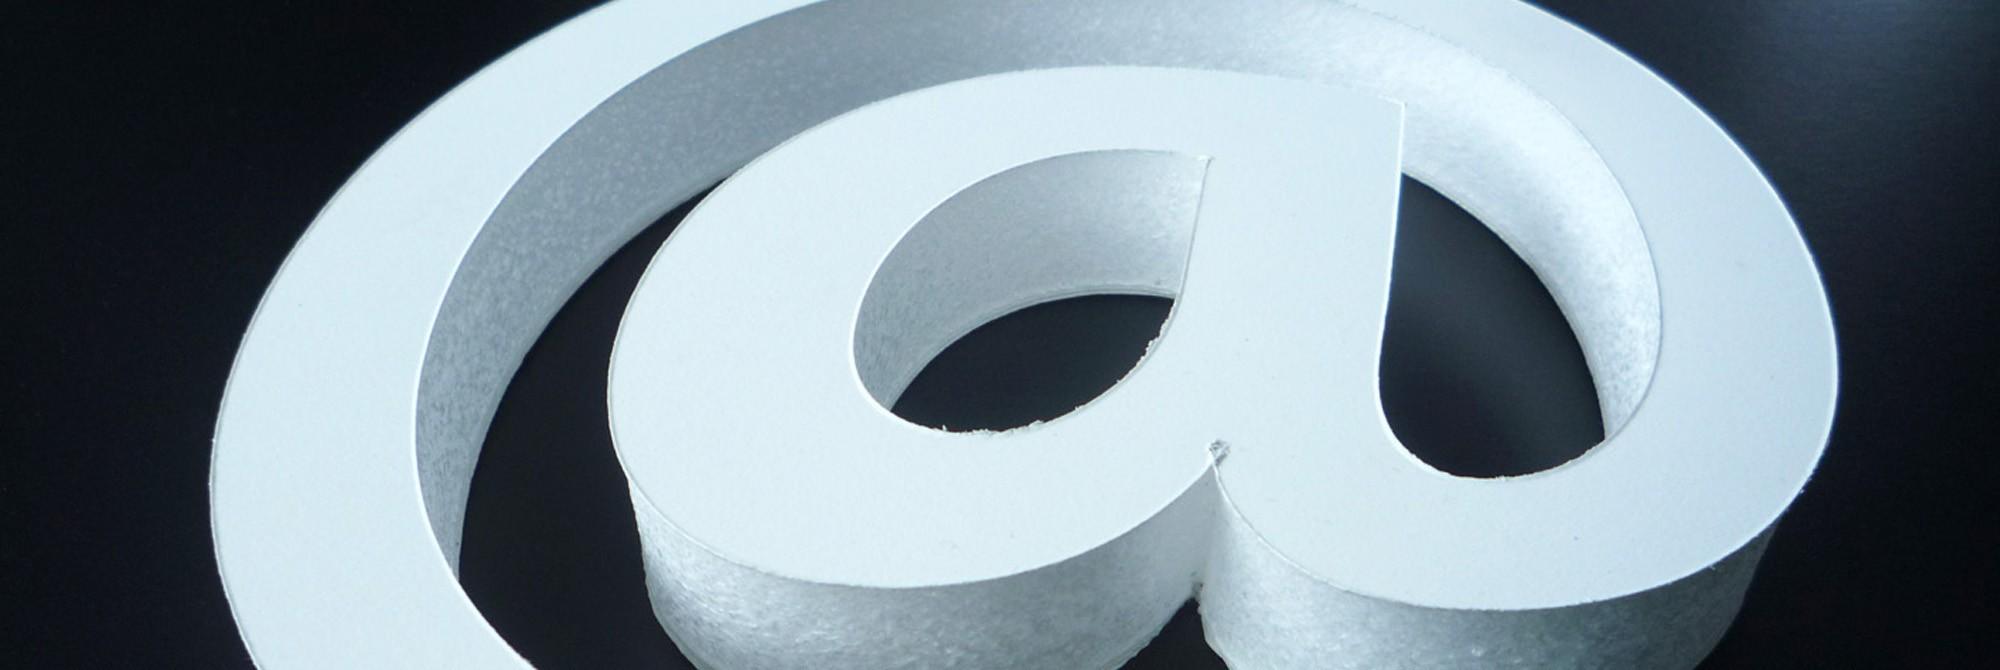 SMART-X® Polystyrol Leichtstoffplatte